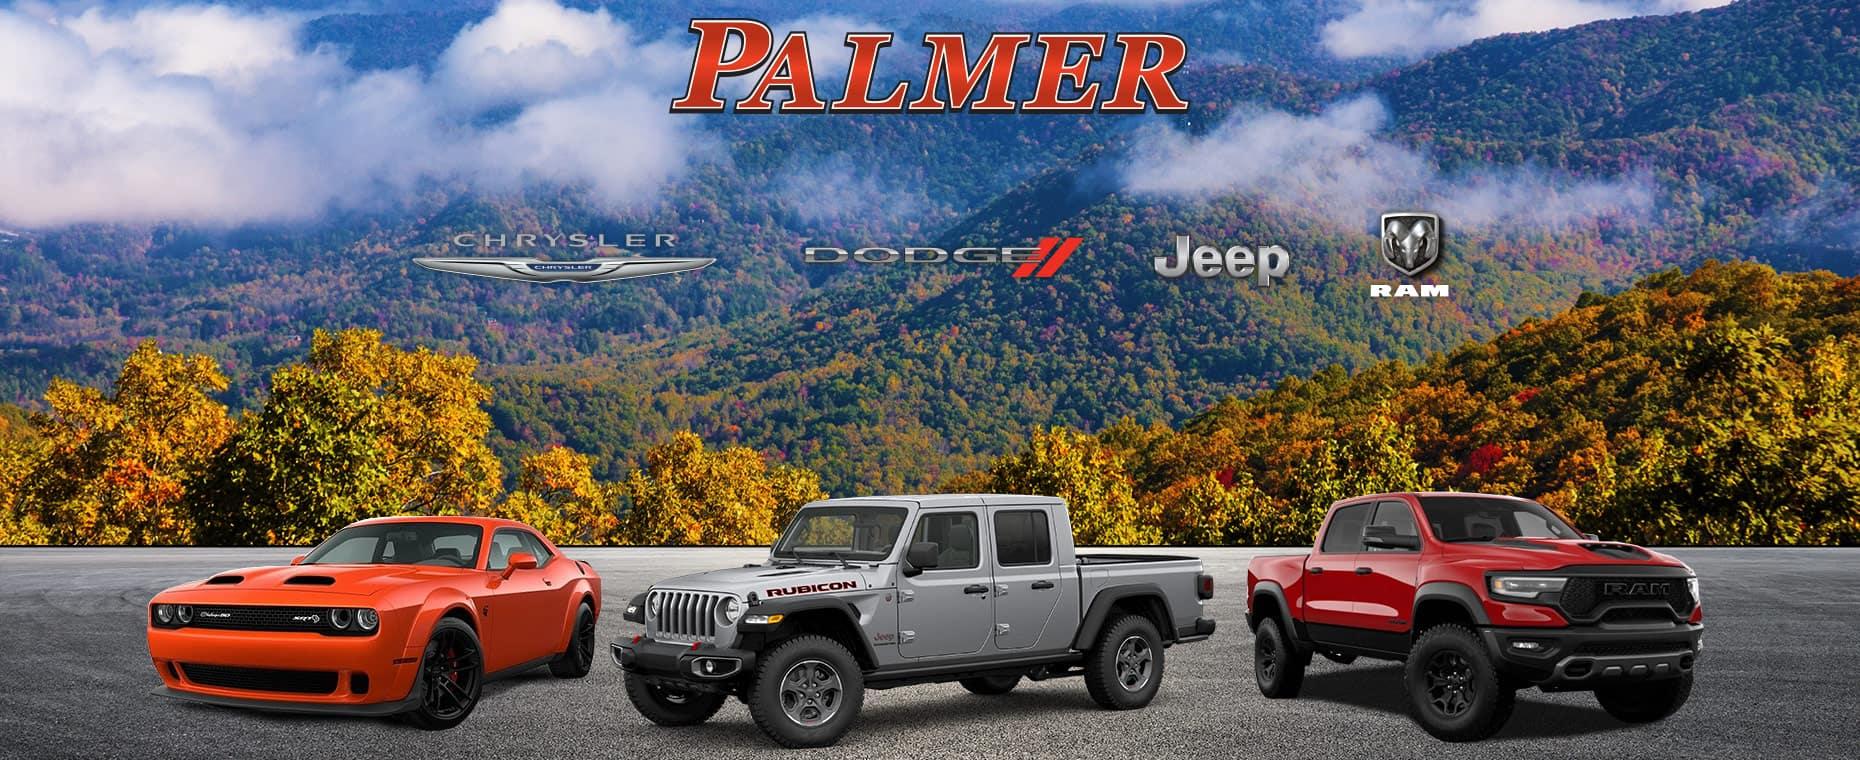 Palmer Dodge Hero Image of Georgia Mountains